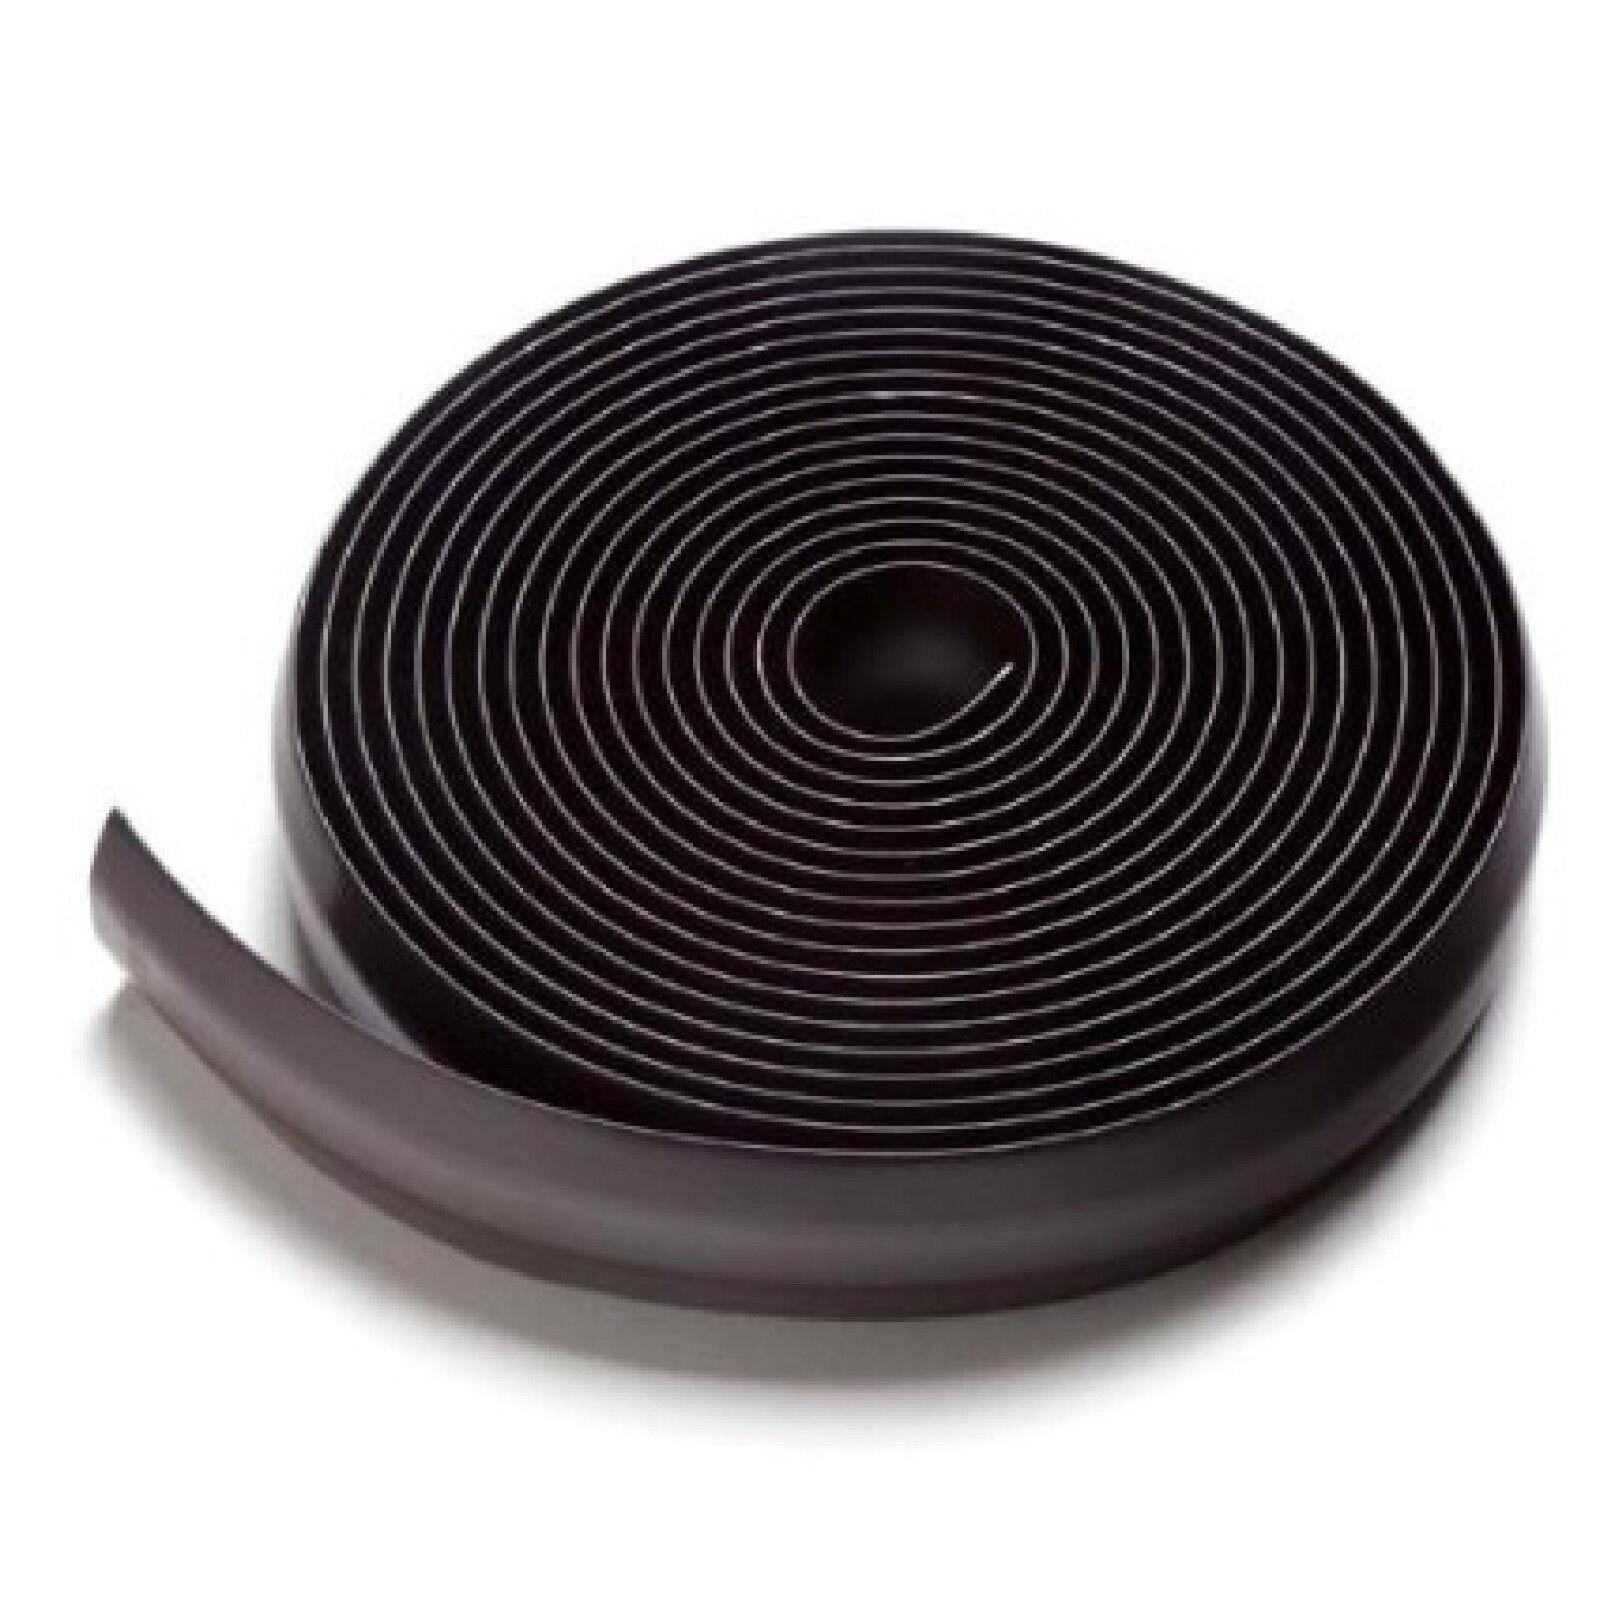 Boundary Magnetic Tape Marker Strip Neato BotVac XV Robot Vacuum 13 Feet long